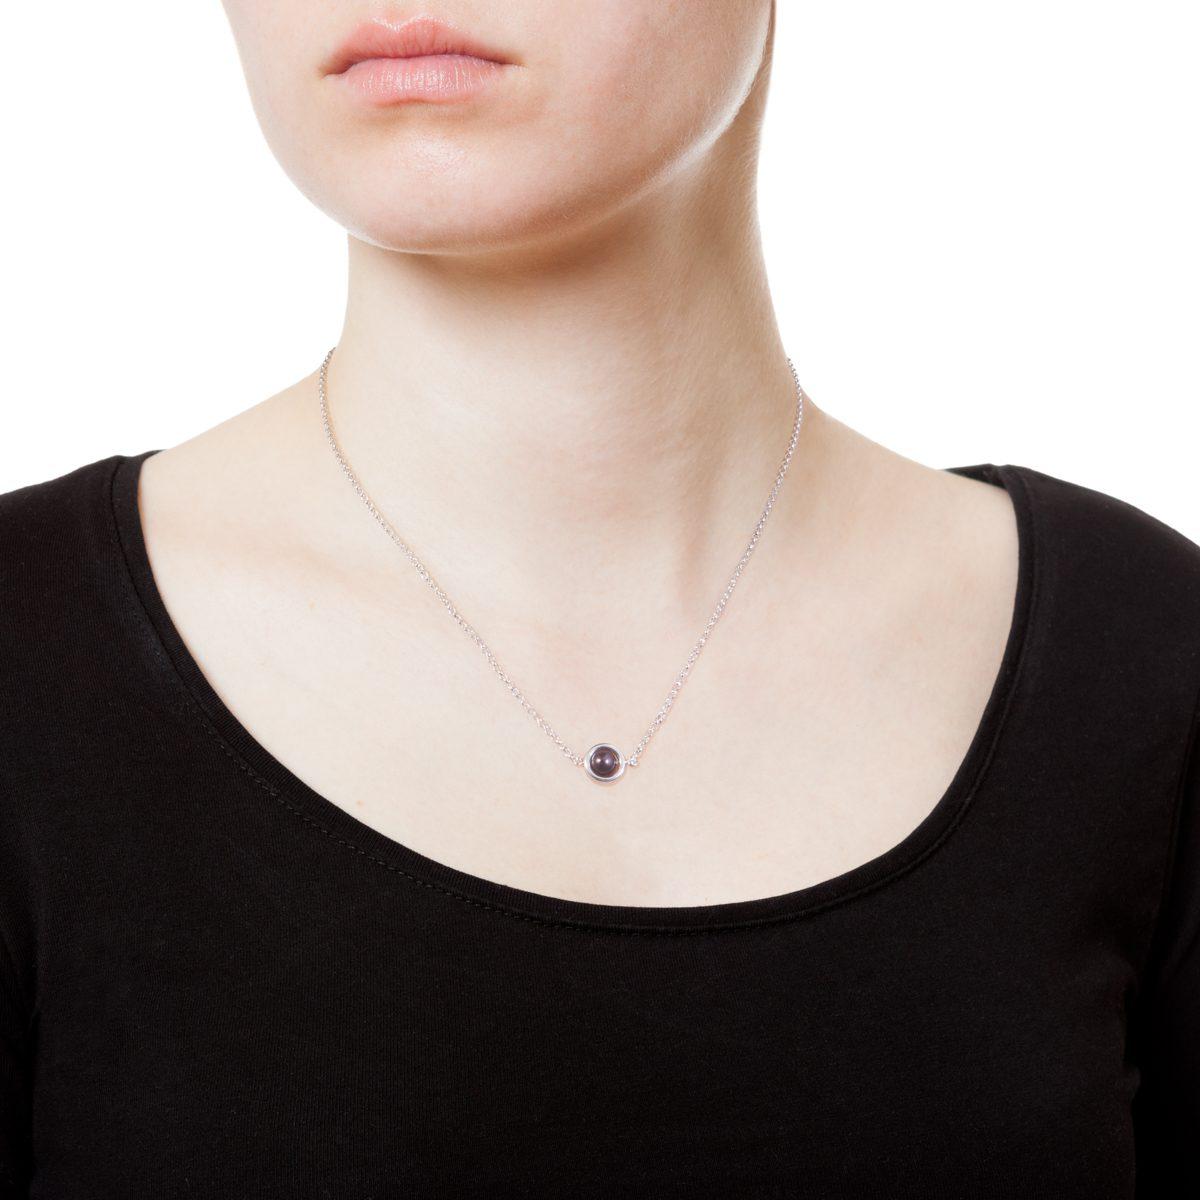 Antipearle Circle Dark Pearl Chain Necklace Silver